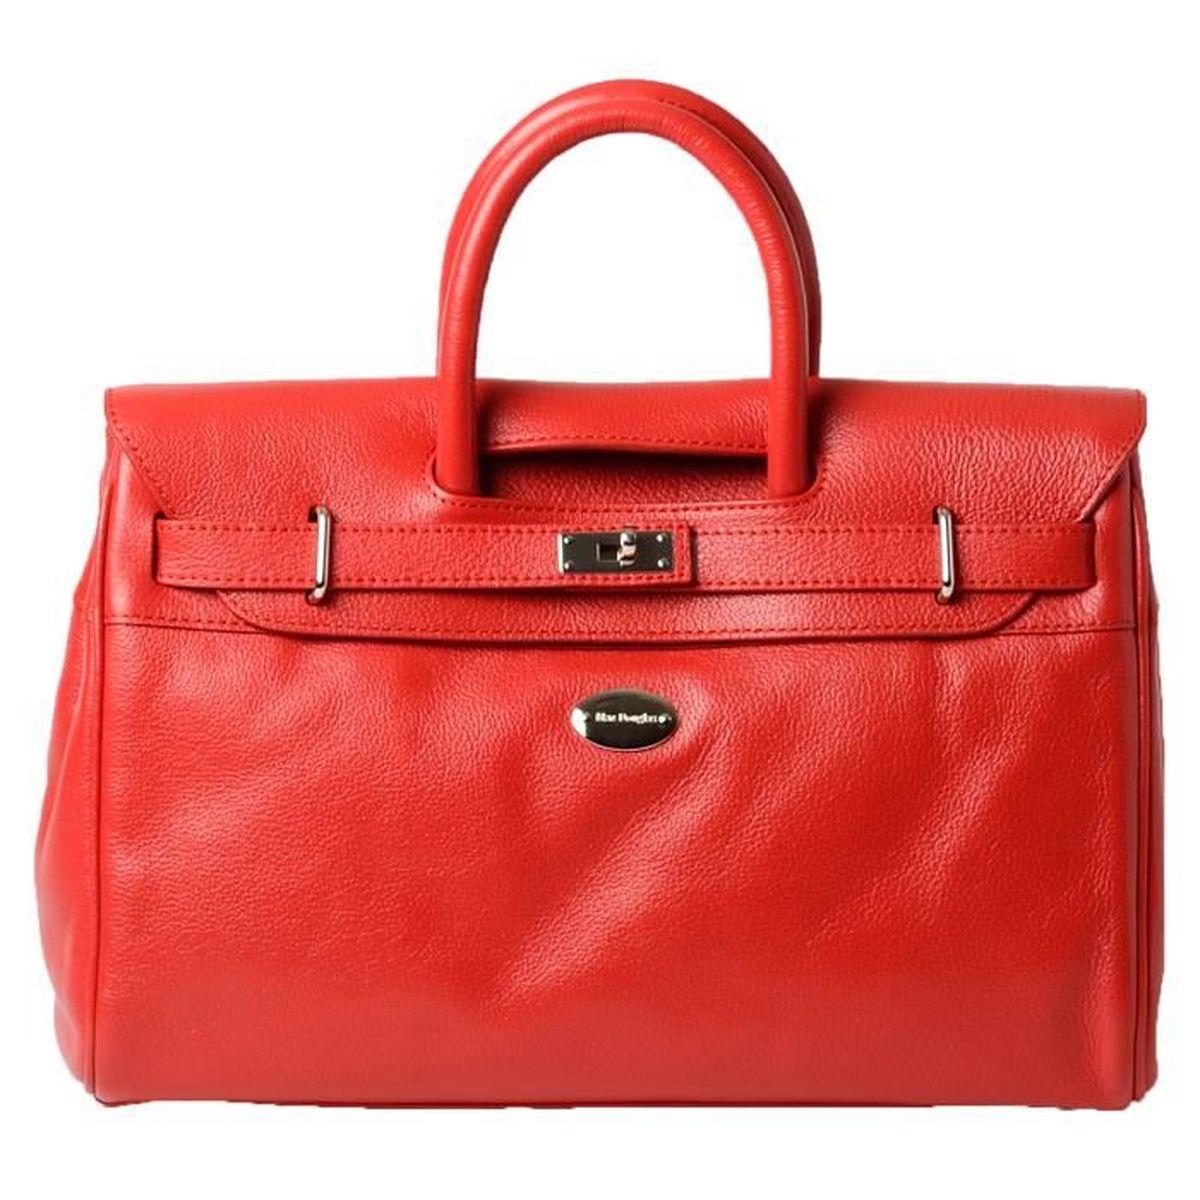 sac main mac douglas de la ligne pyla buni taille xs en cuir de buffle achat vente sac. Black Bedroom Furniture Sets. Home Design Ideas